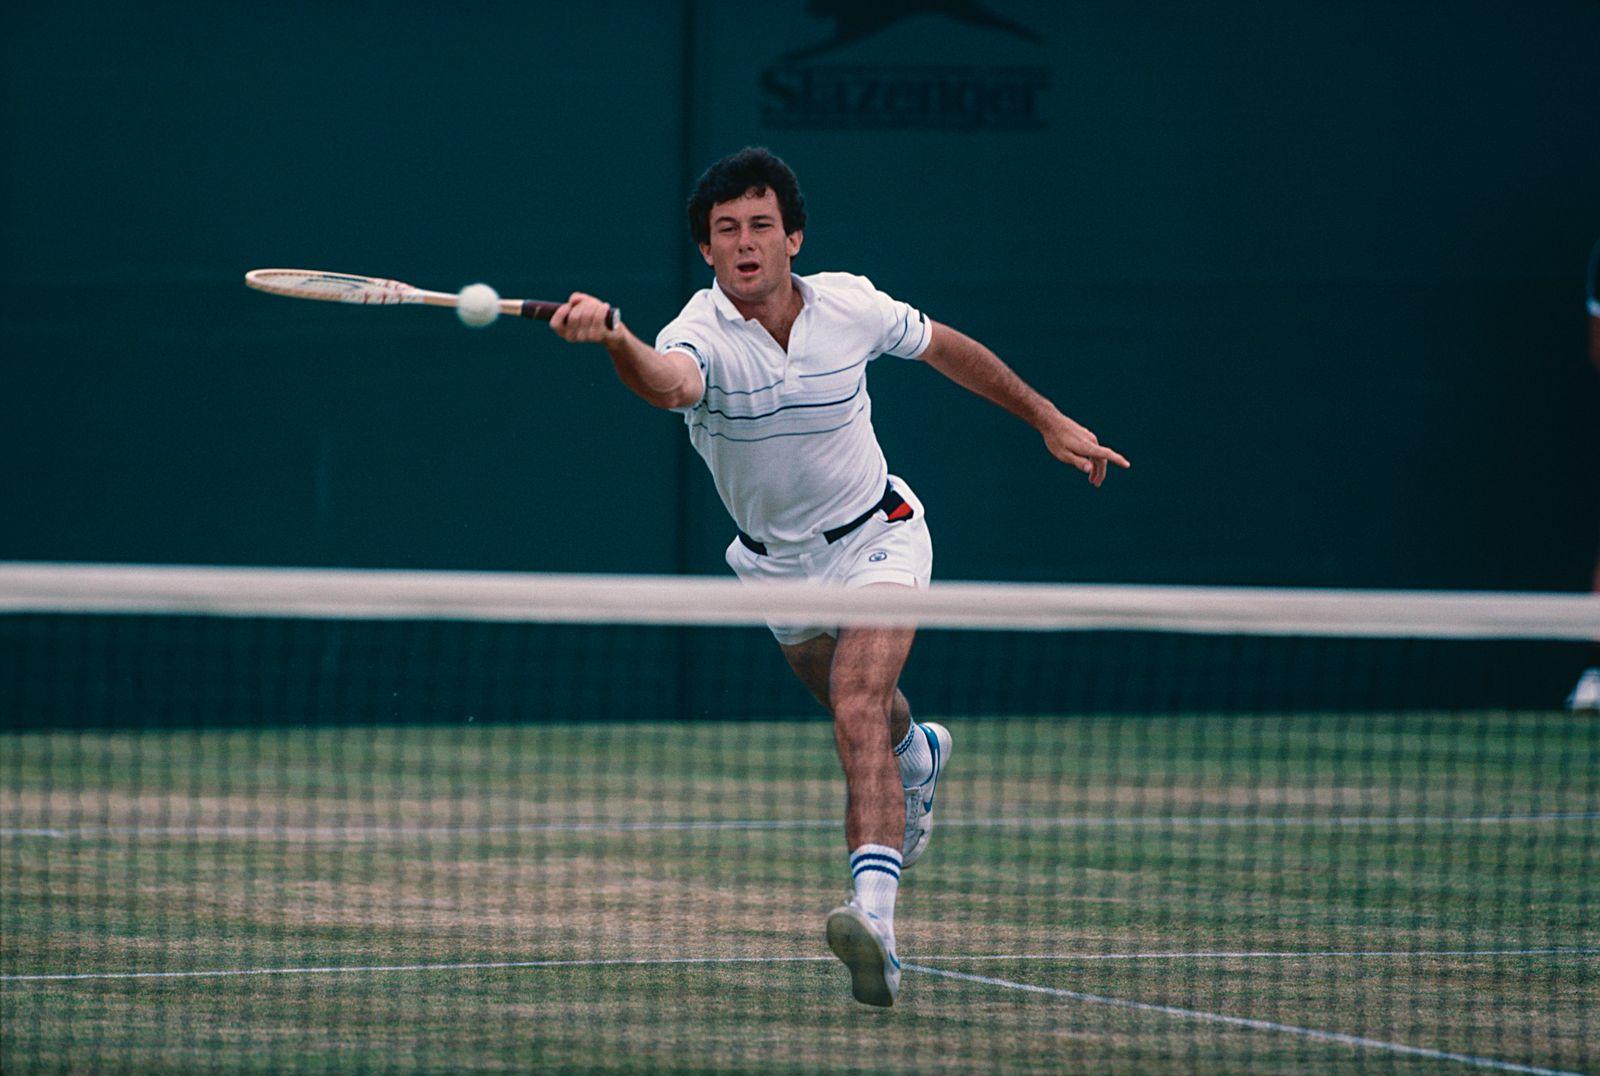 Bill Scanlon At 1983 Wimbledon Championships